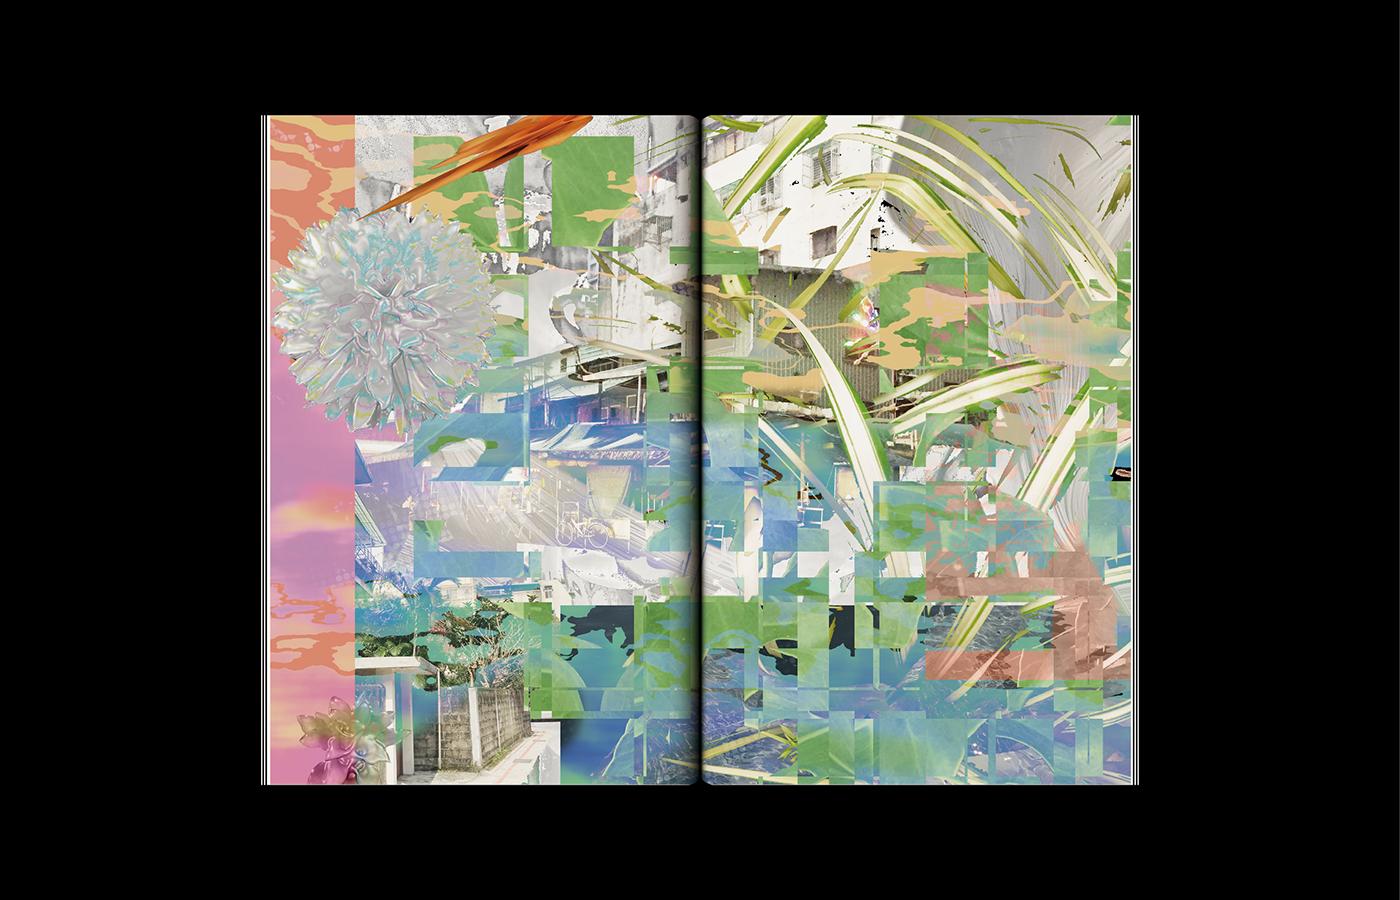 Daoism taoism philosophy  graphic design  editorial design  book design visual research design research